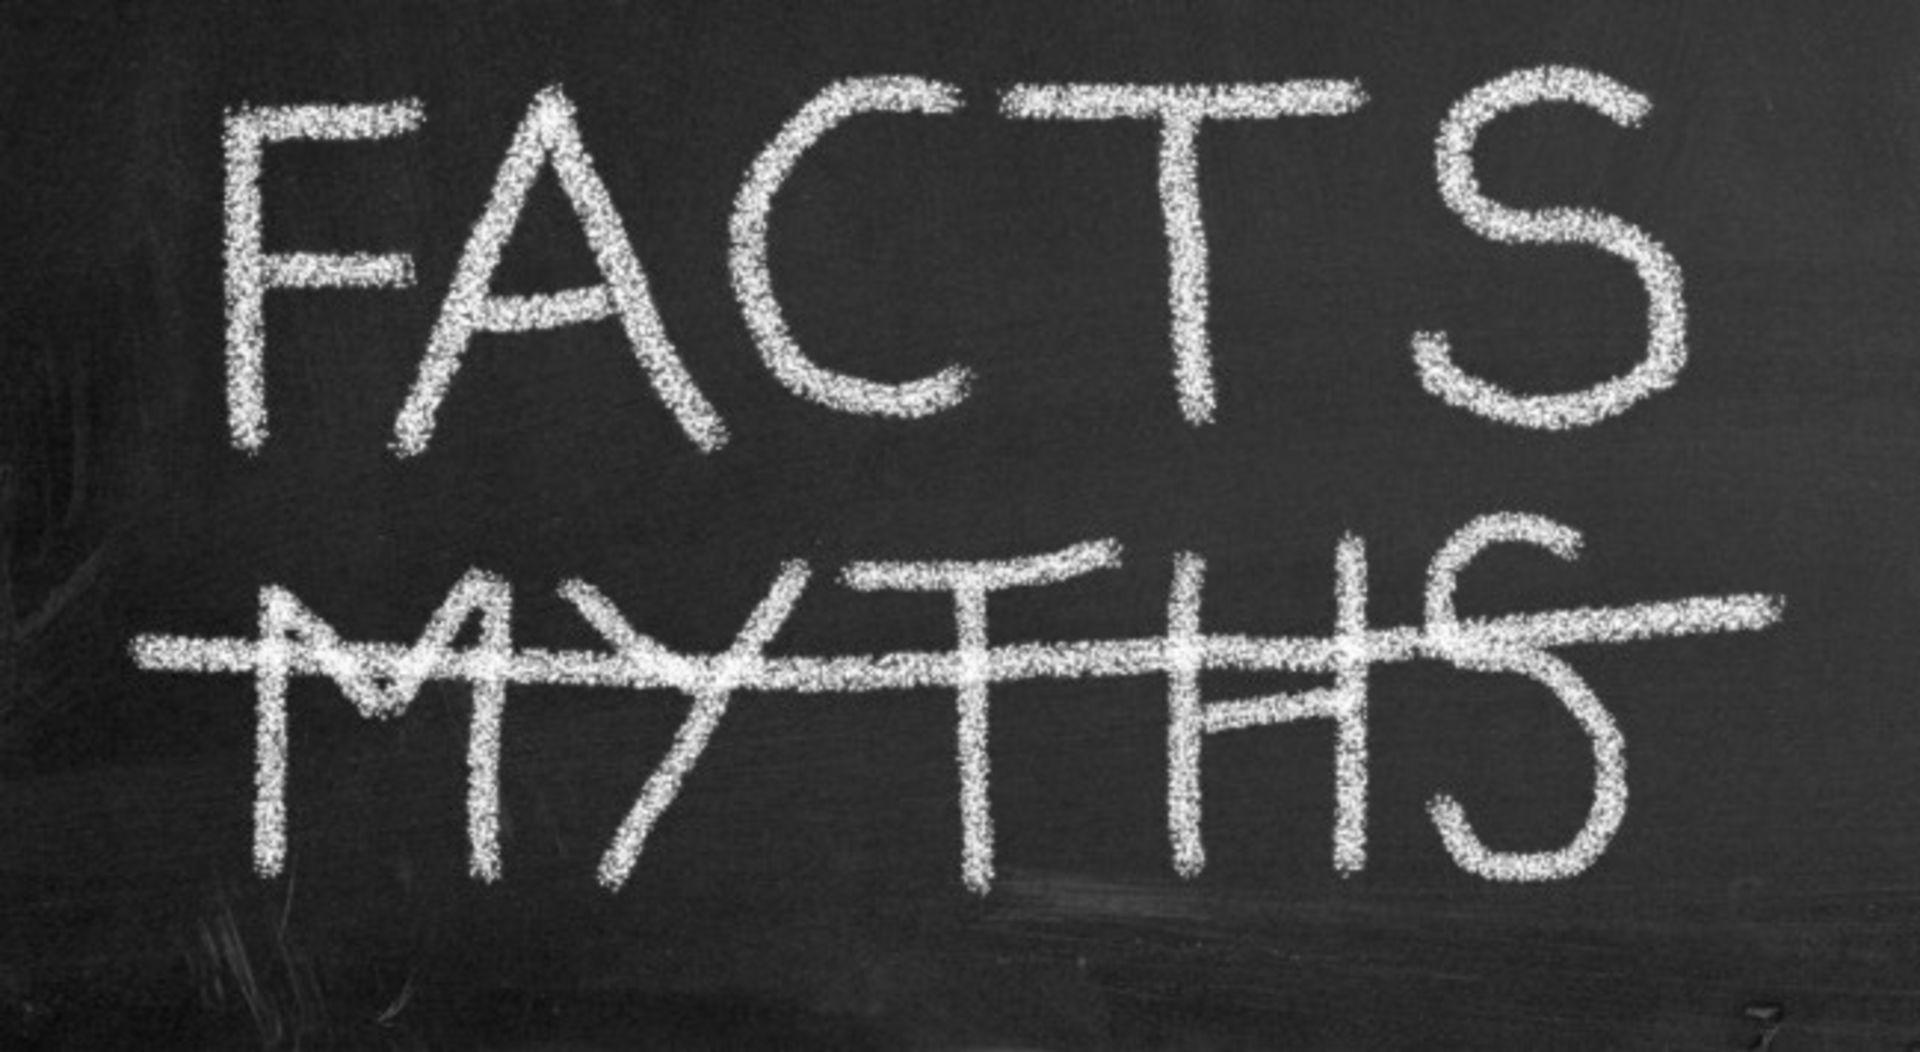 Selling Myths